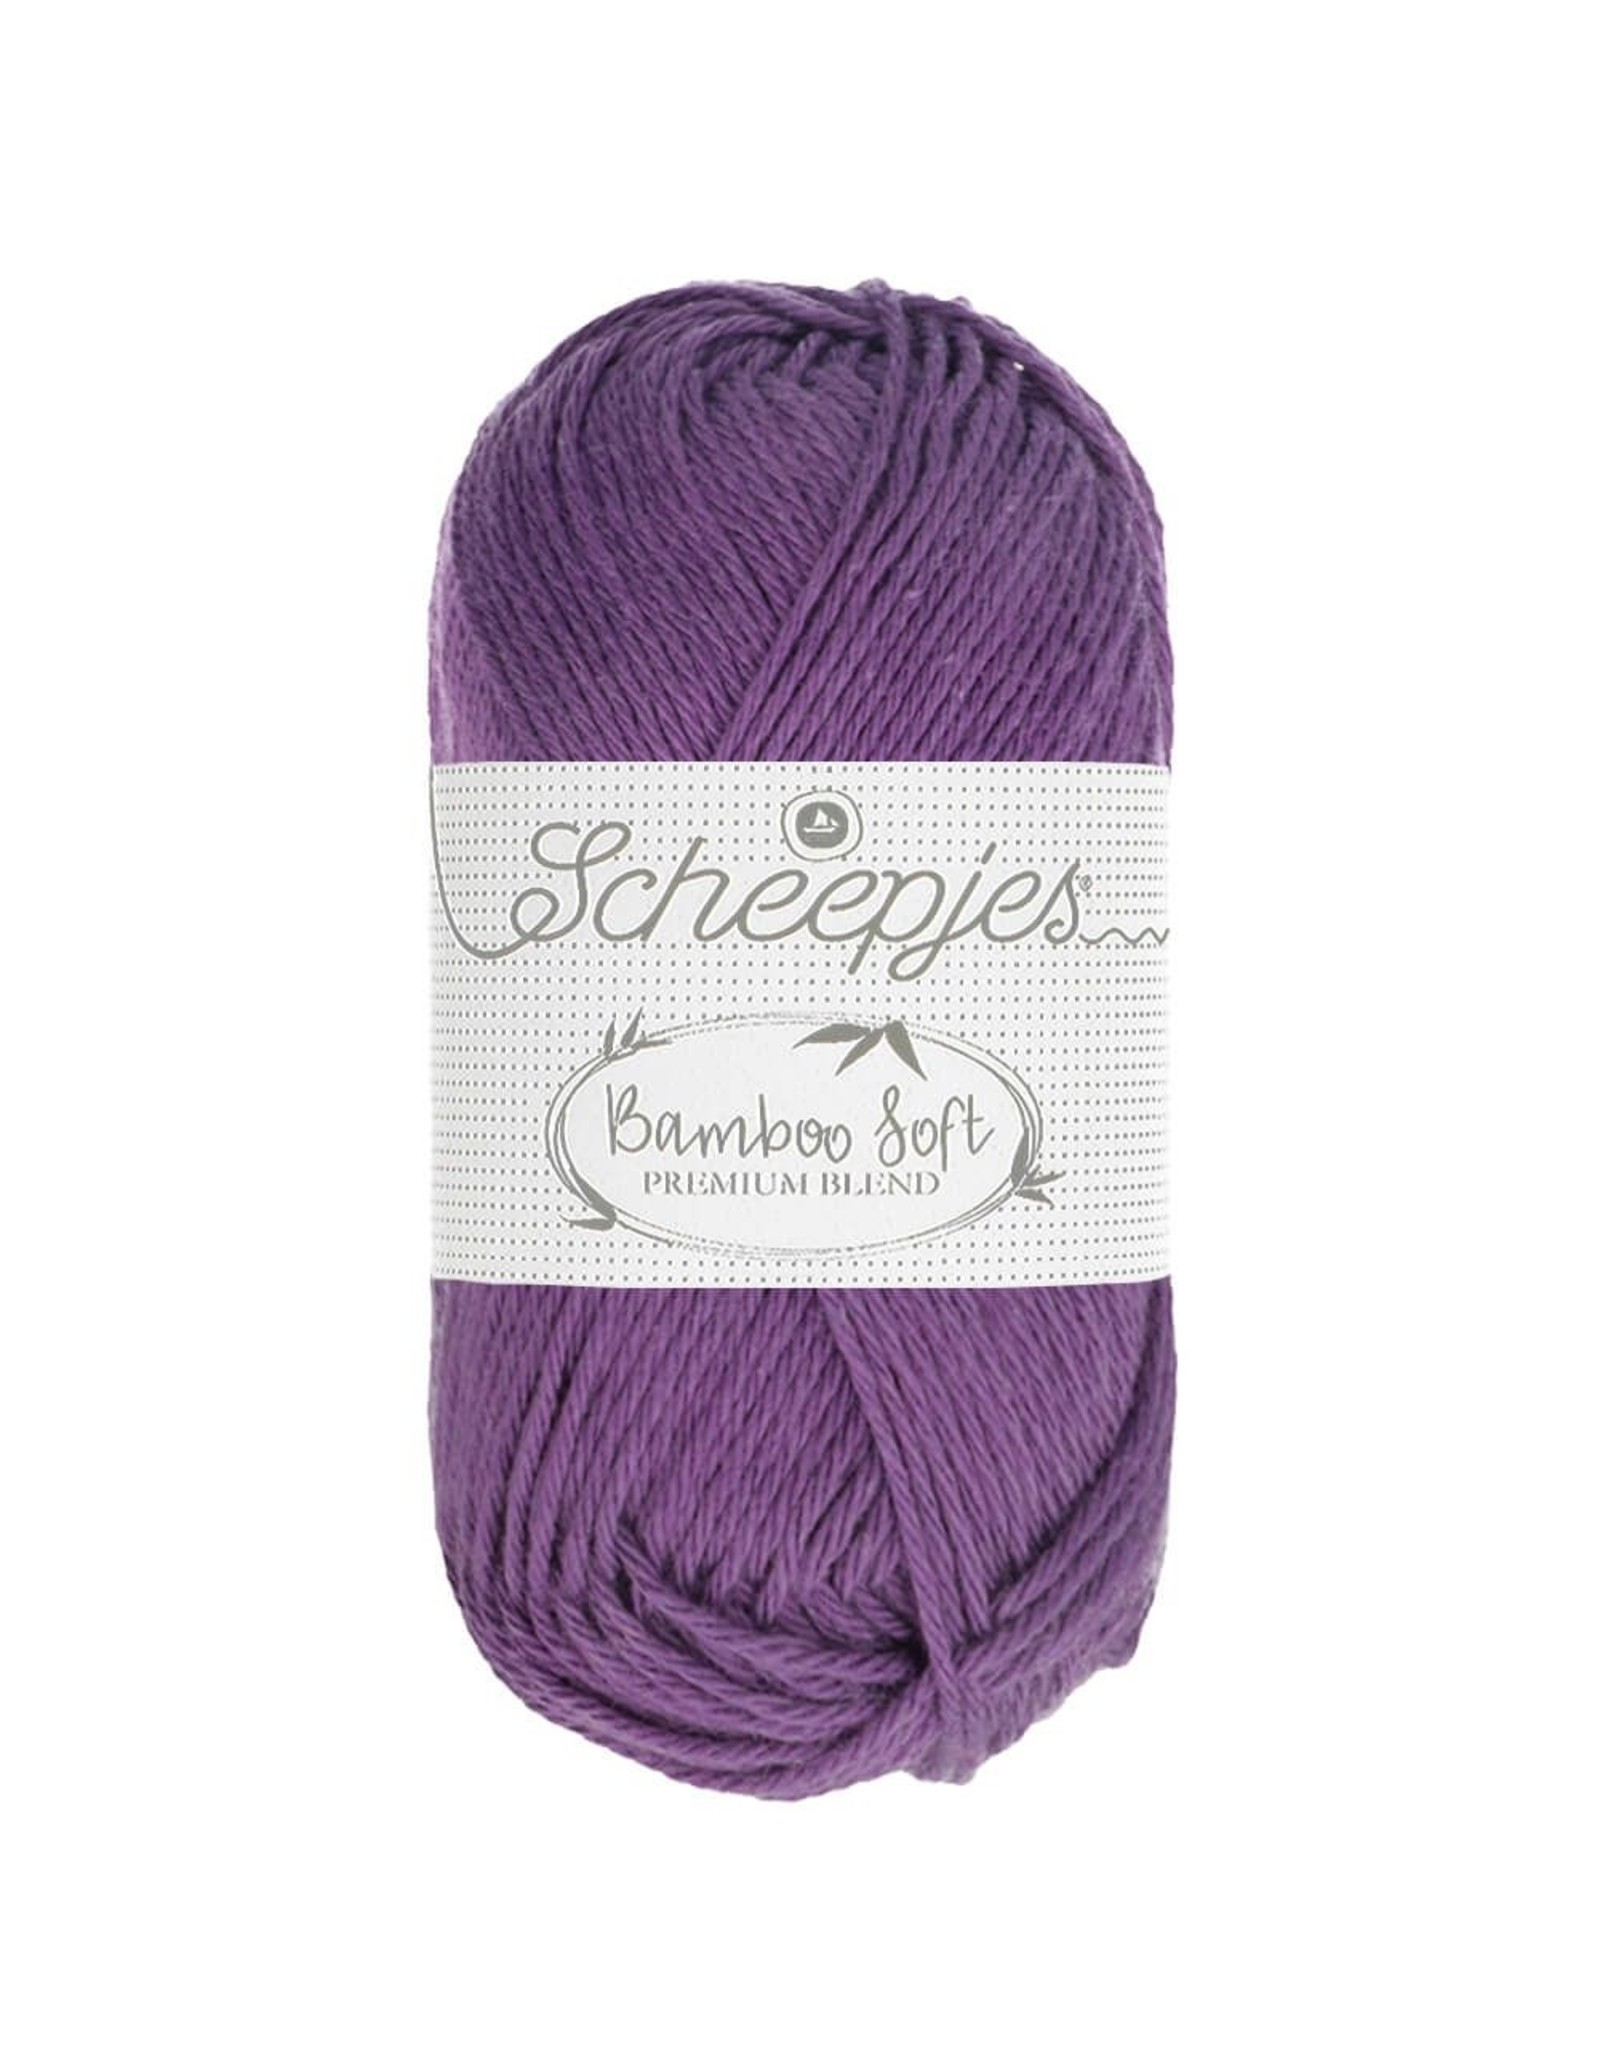 Scheepjes Scheepjes Bamboo Soft kleur kleur 252 Royal Purple bundel 5 bollen x 50 gr.